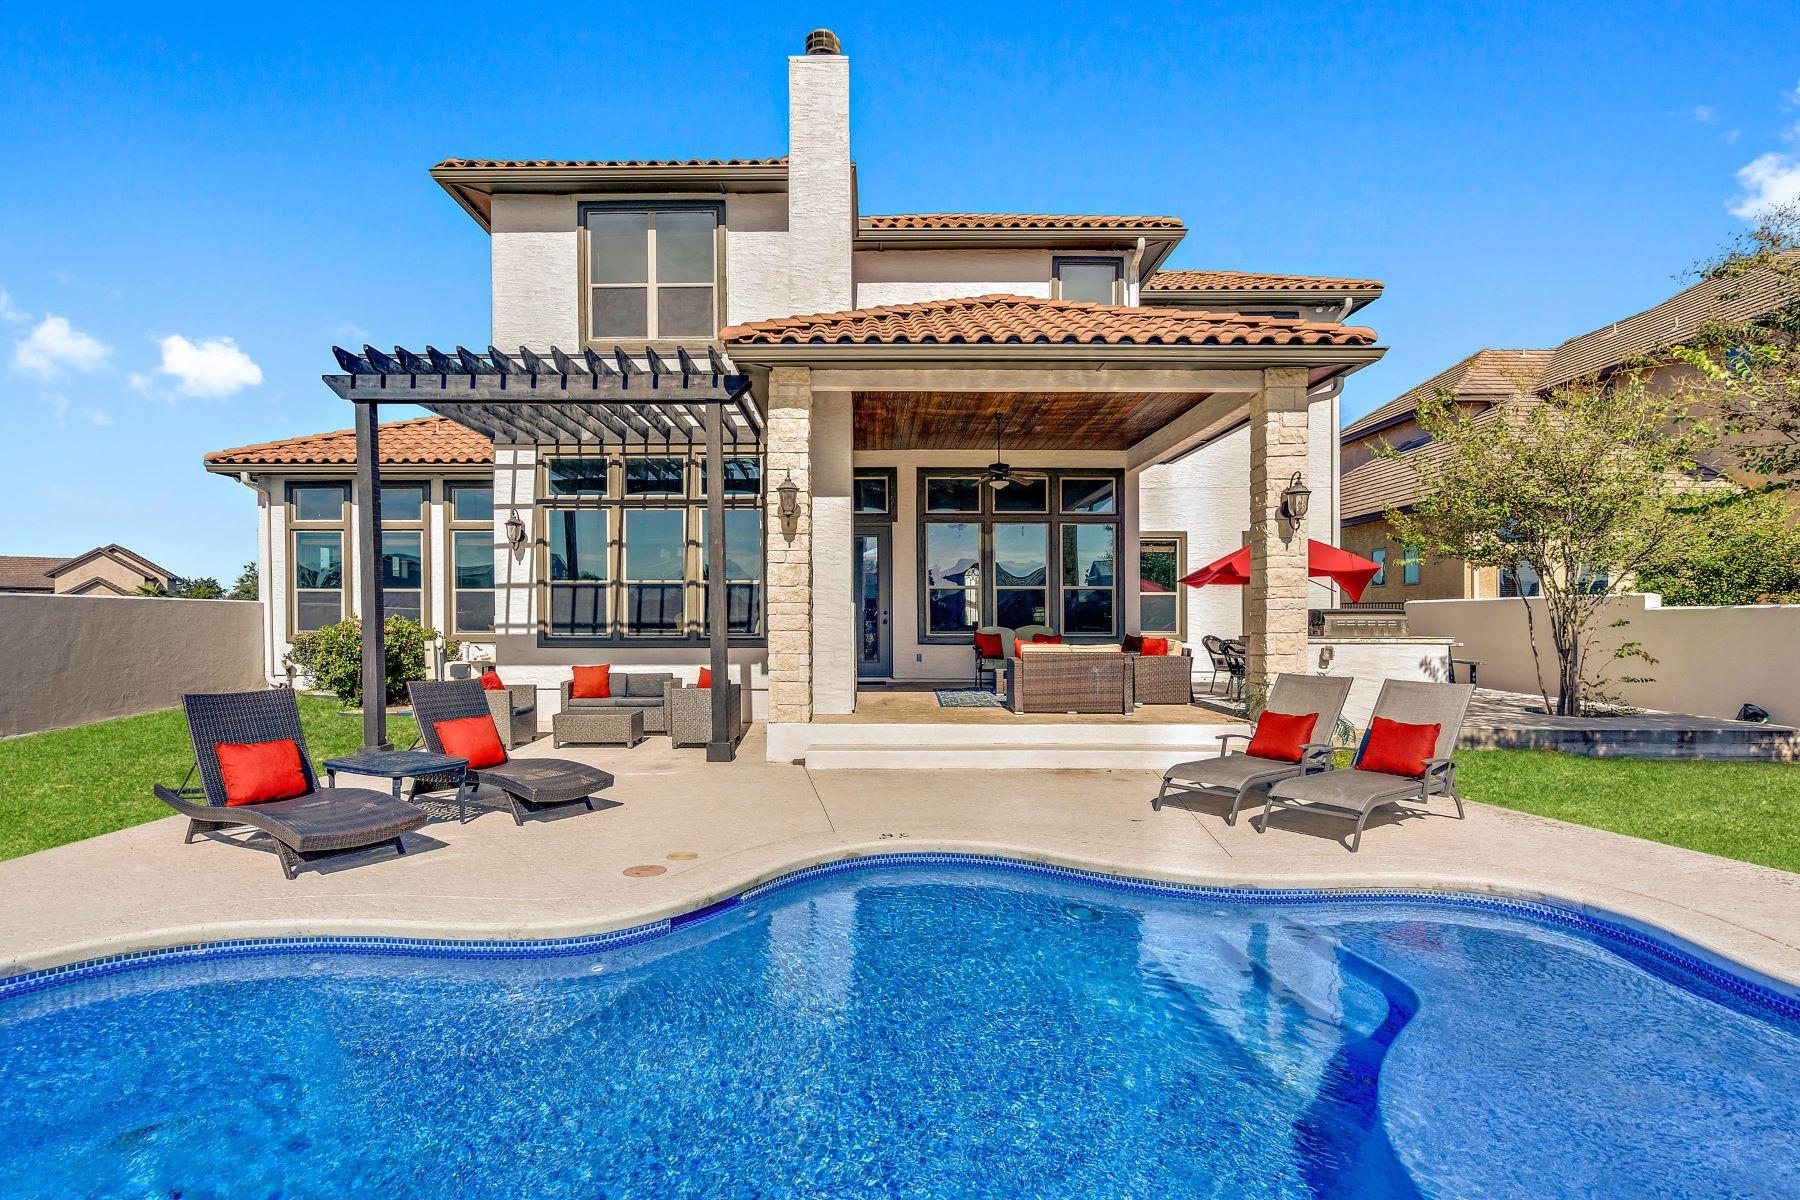 Single Family Homes for Sale at Santa Barbara Style Living on Lake LBJ 311 Clearwater Drive on Lake LBJ Kingsland, Texas 78639 United States